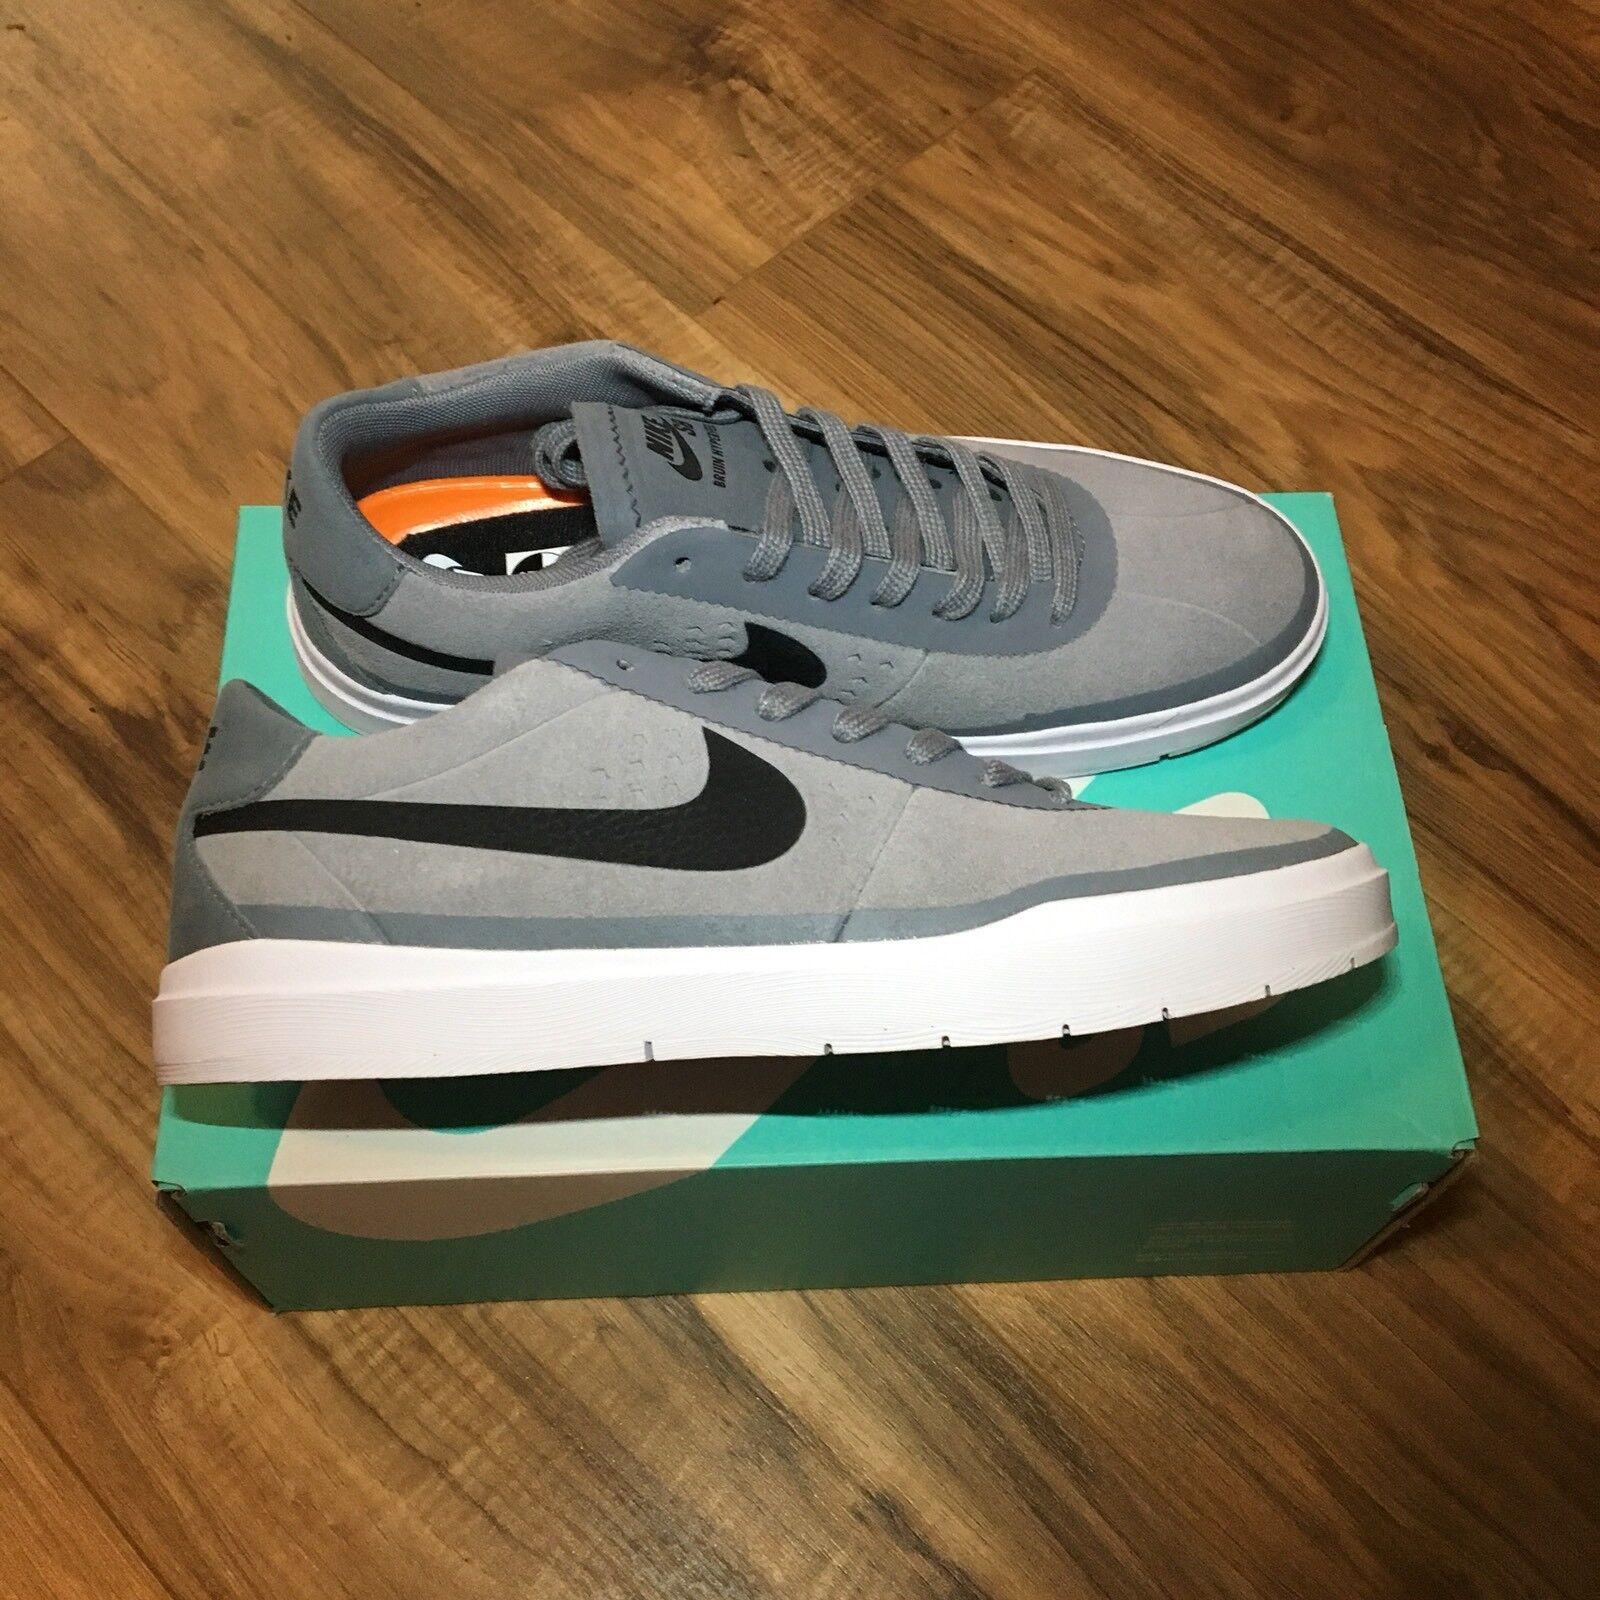 Nike SB Bruin Hyperfeel Skateboard Shoe Cool Grey Black White Sz 5.5 831756-002